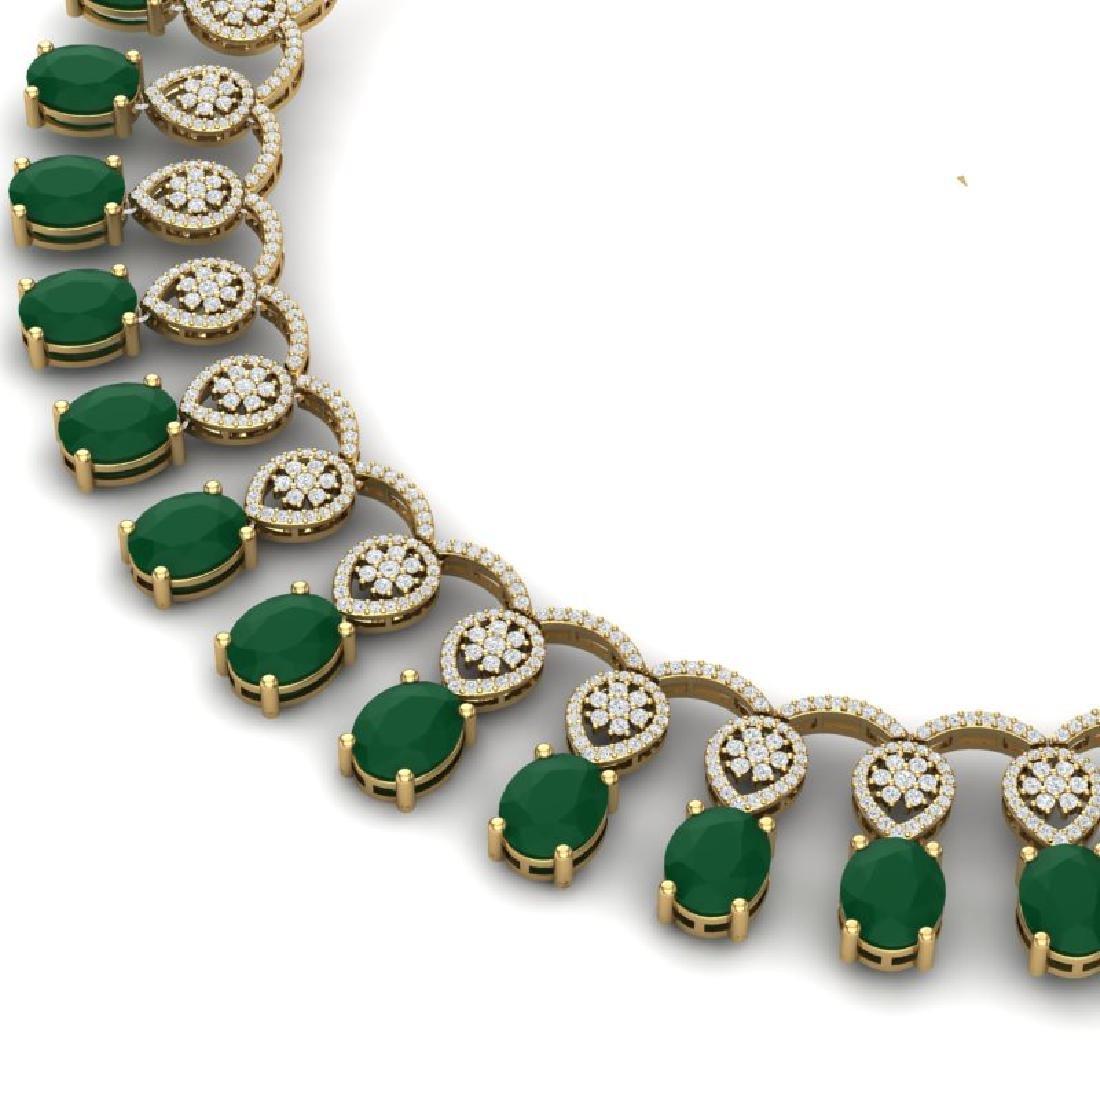 54.05 CTW Royalty Emerald & VS Diamond Necklace 18K - 2